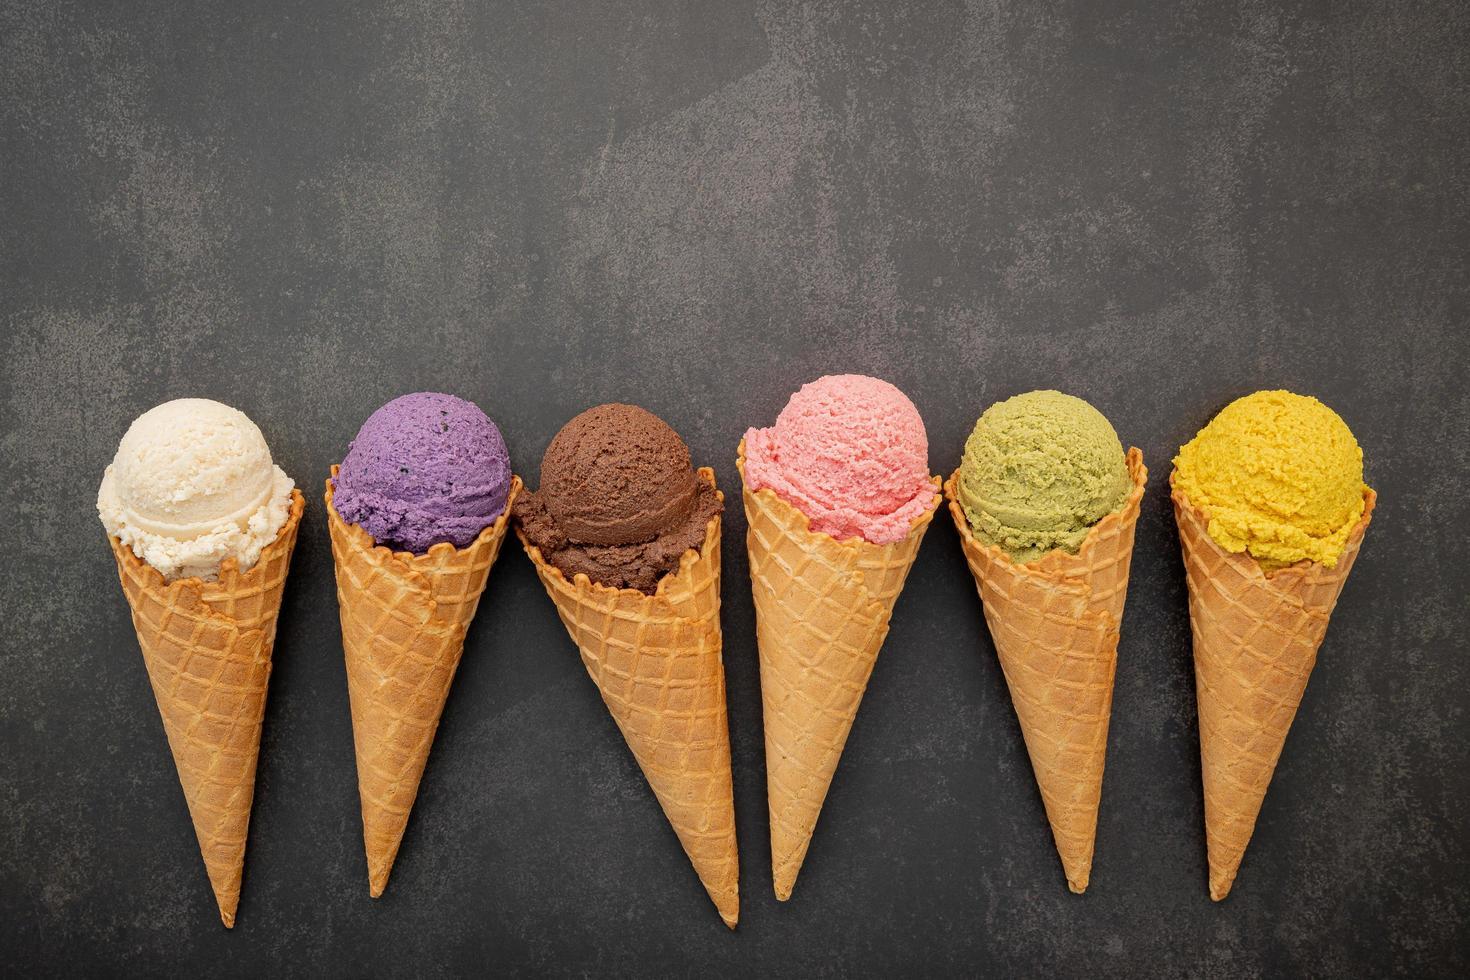 Colorful ice cream in cones on concrete photo